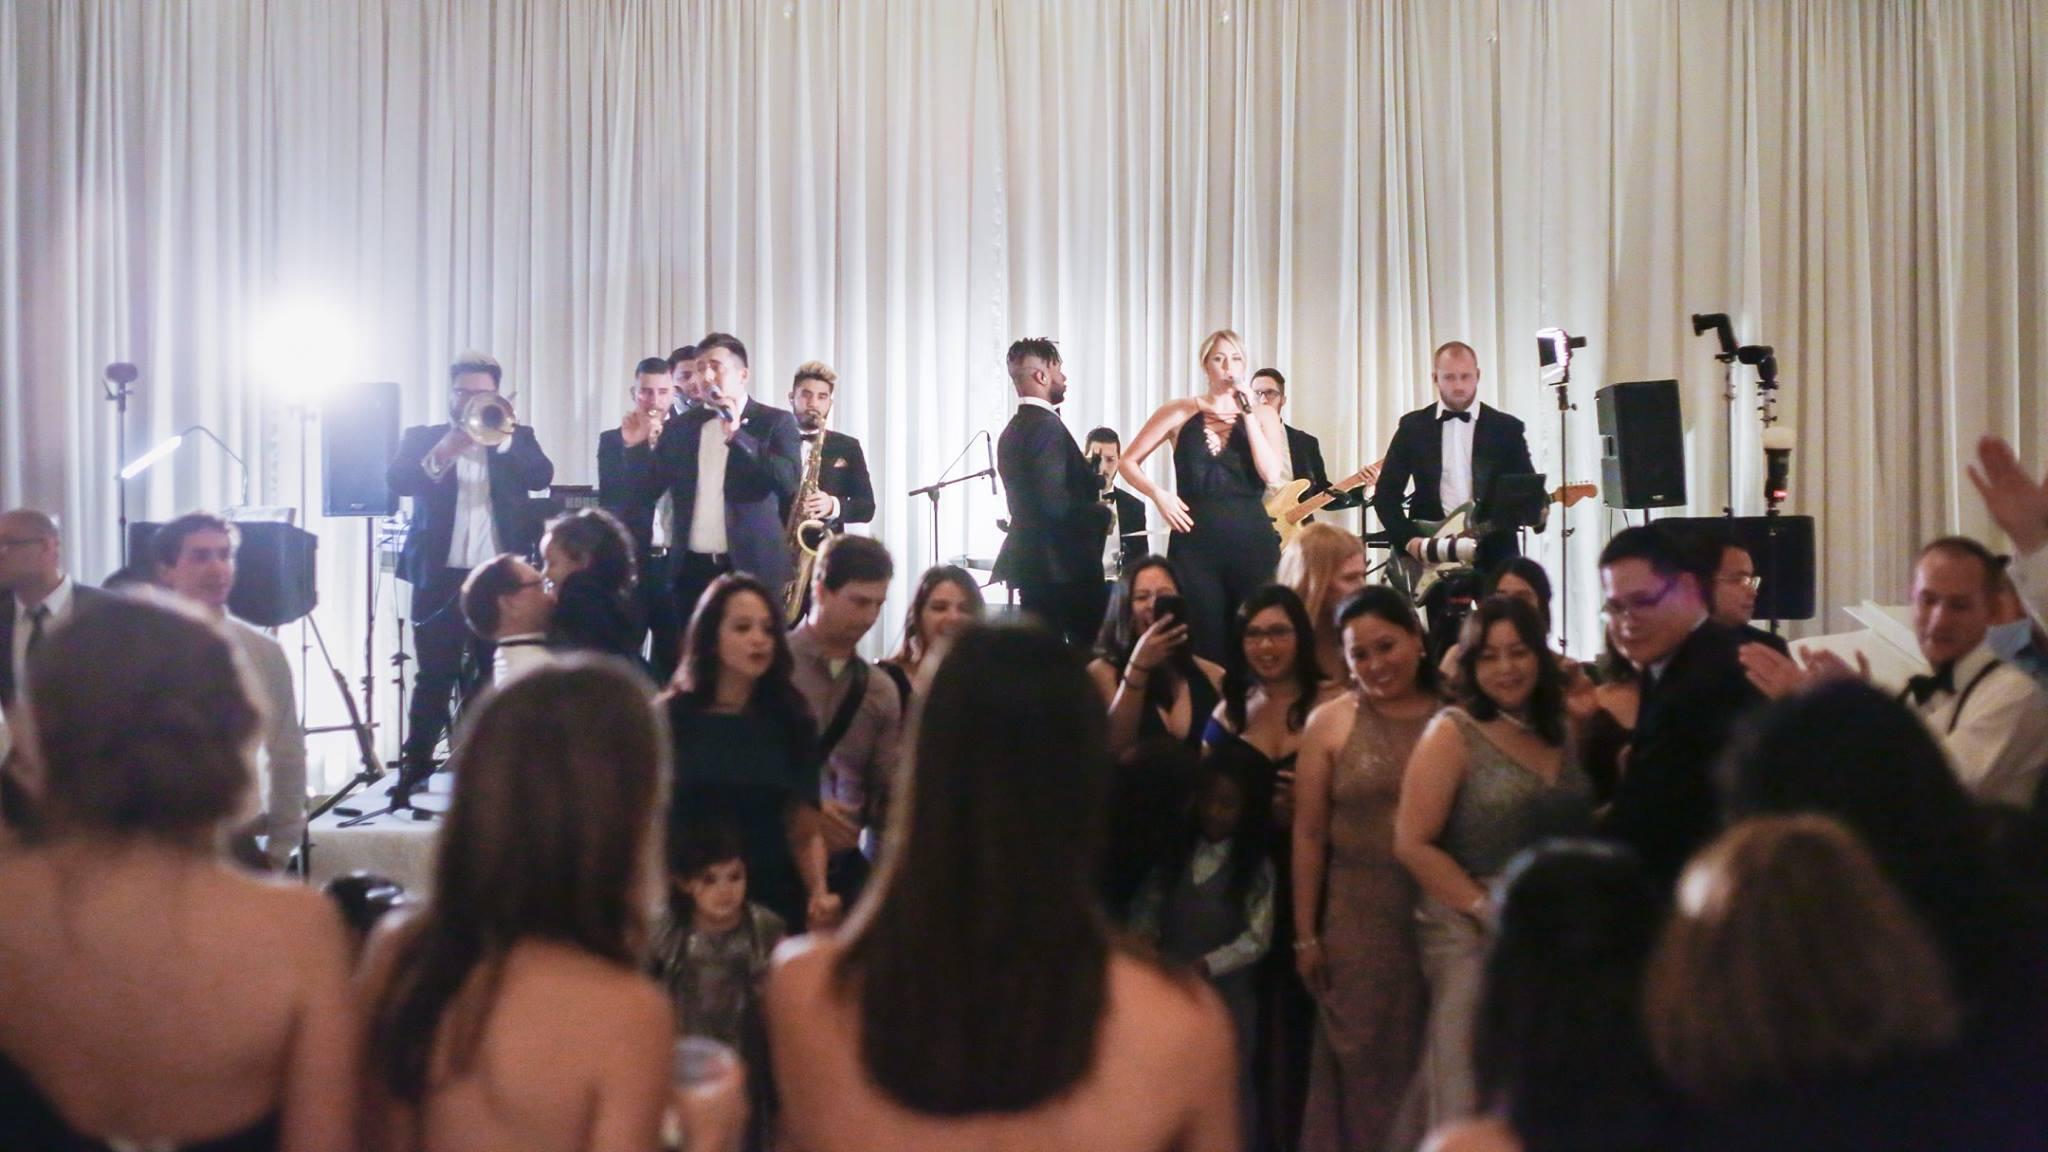 Gold Standard Ritz-Carlton, Laguna Niguel Wedding Band